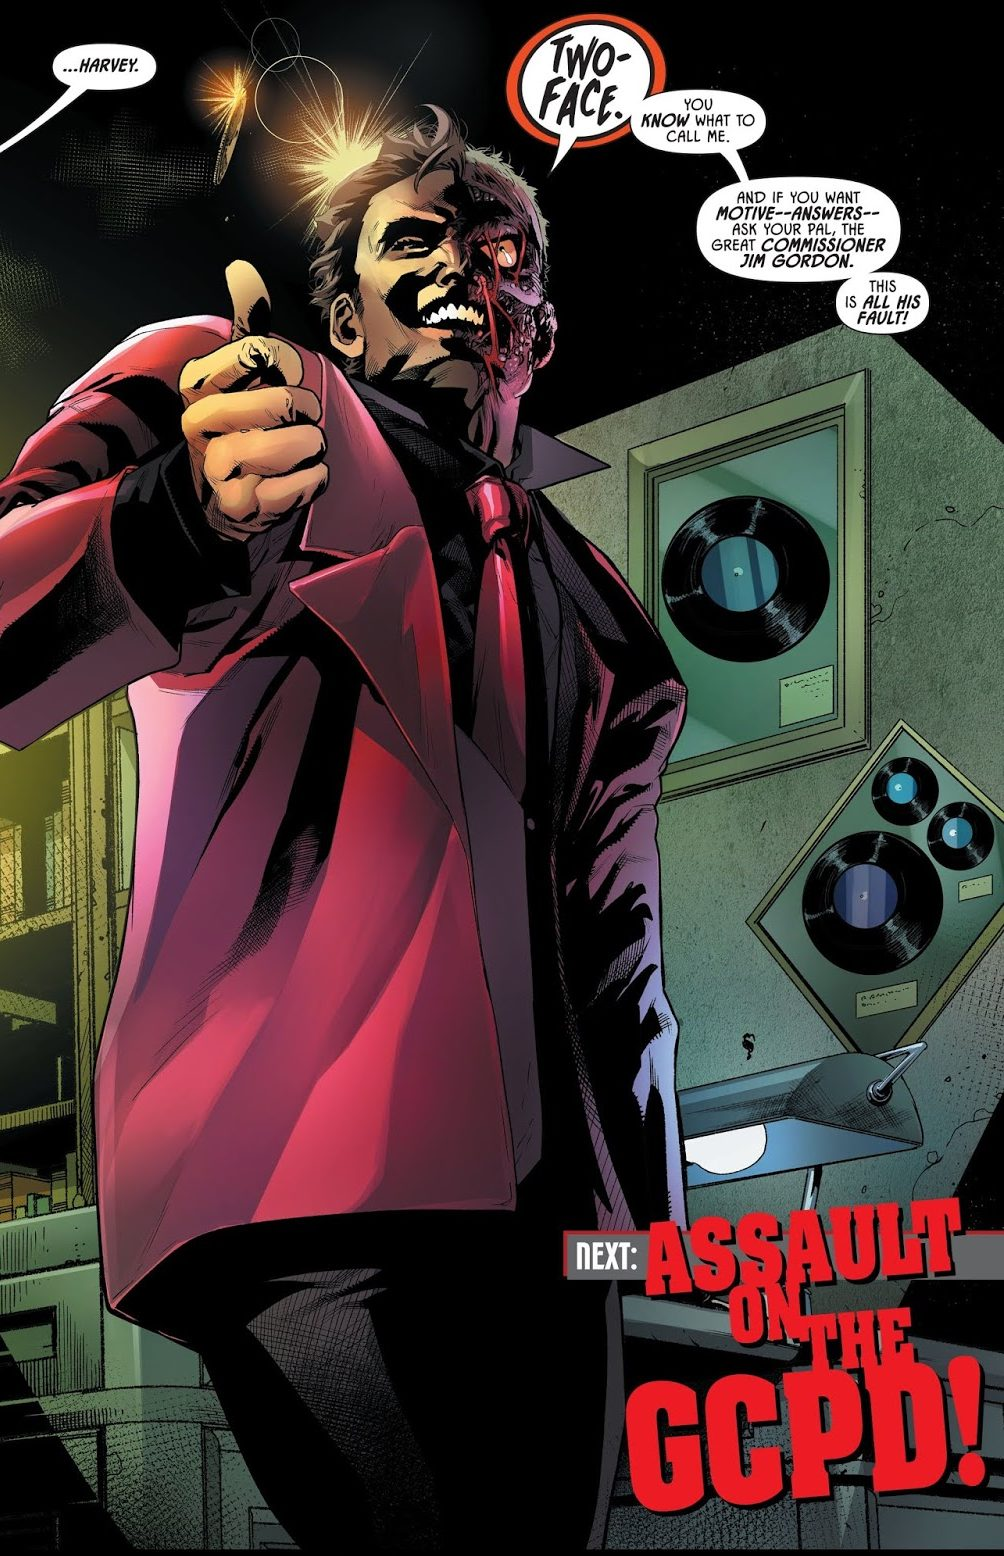 Two-Face (Detective Comics #989)